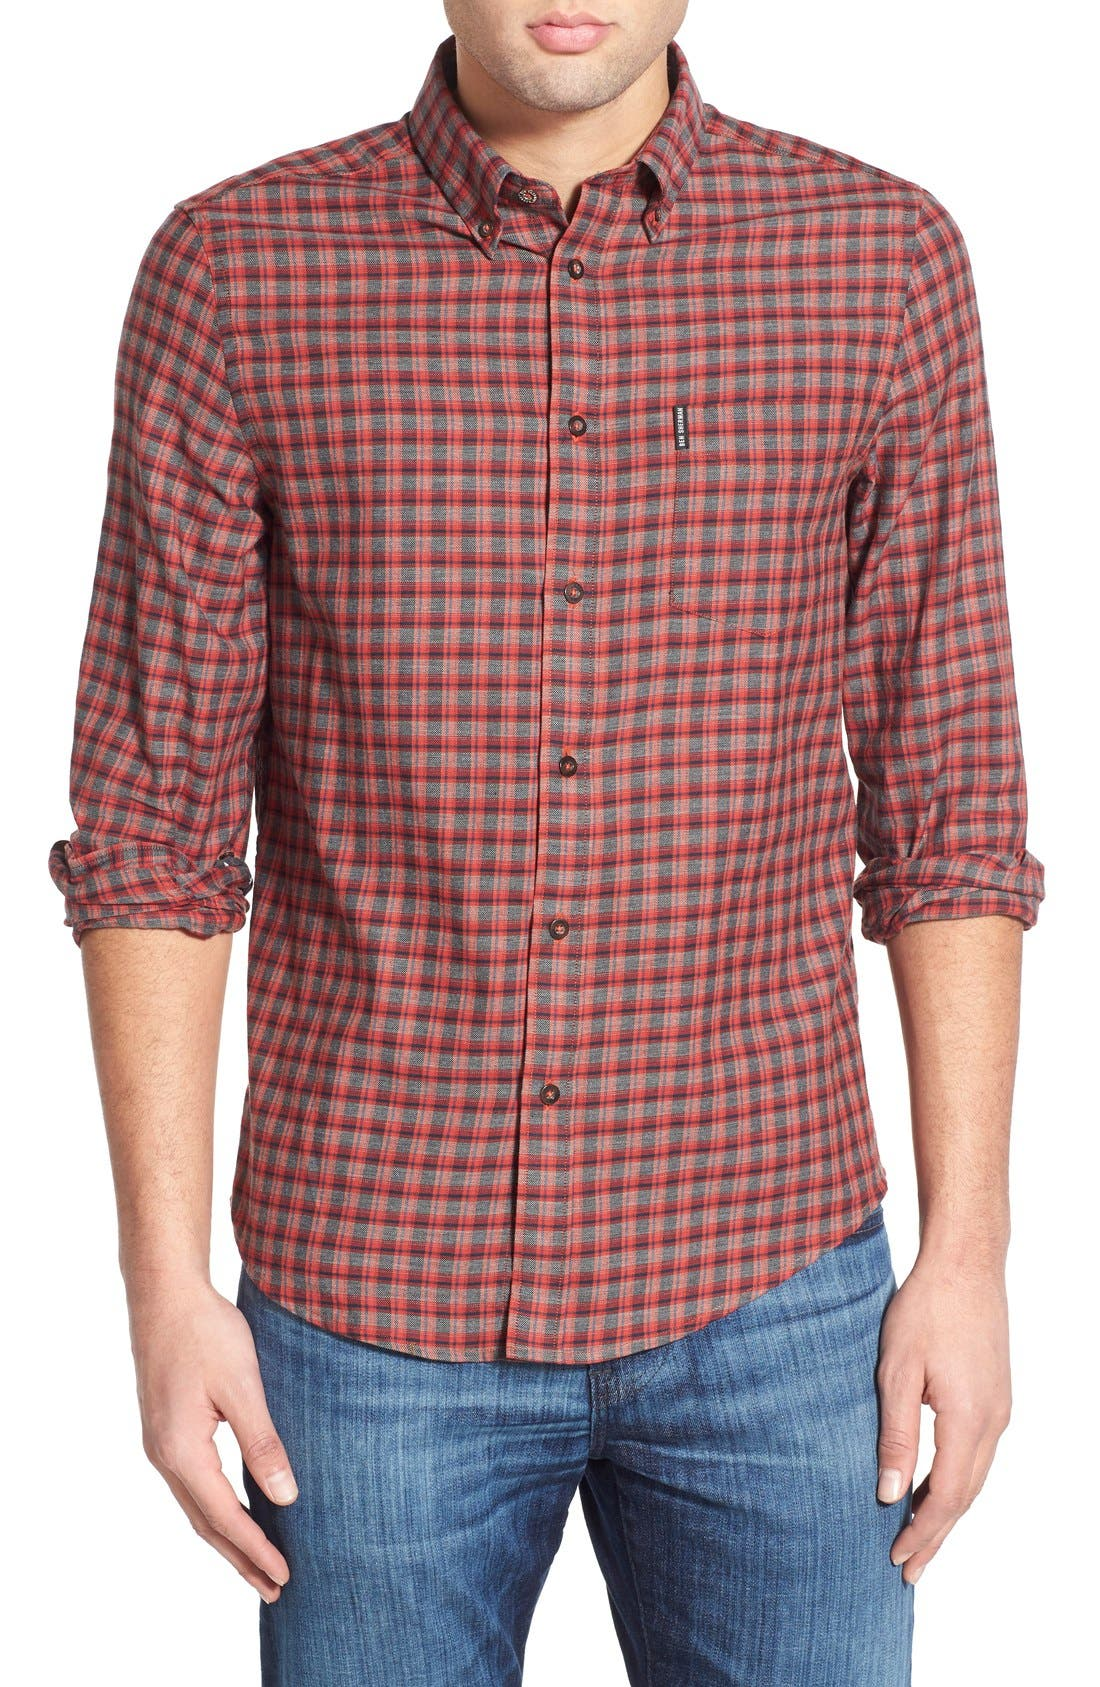 Main Image - Ben Sherman Mod Fit Tartan Plaid Sport Shirt